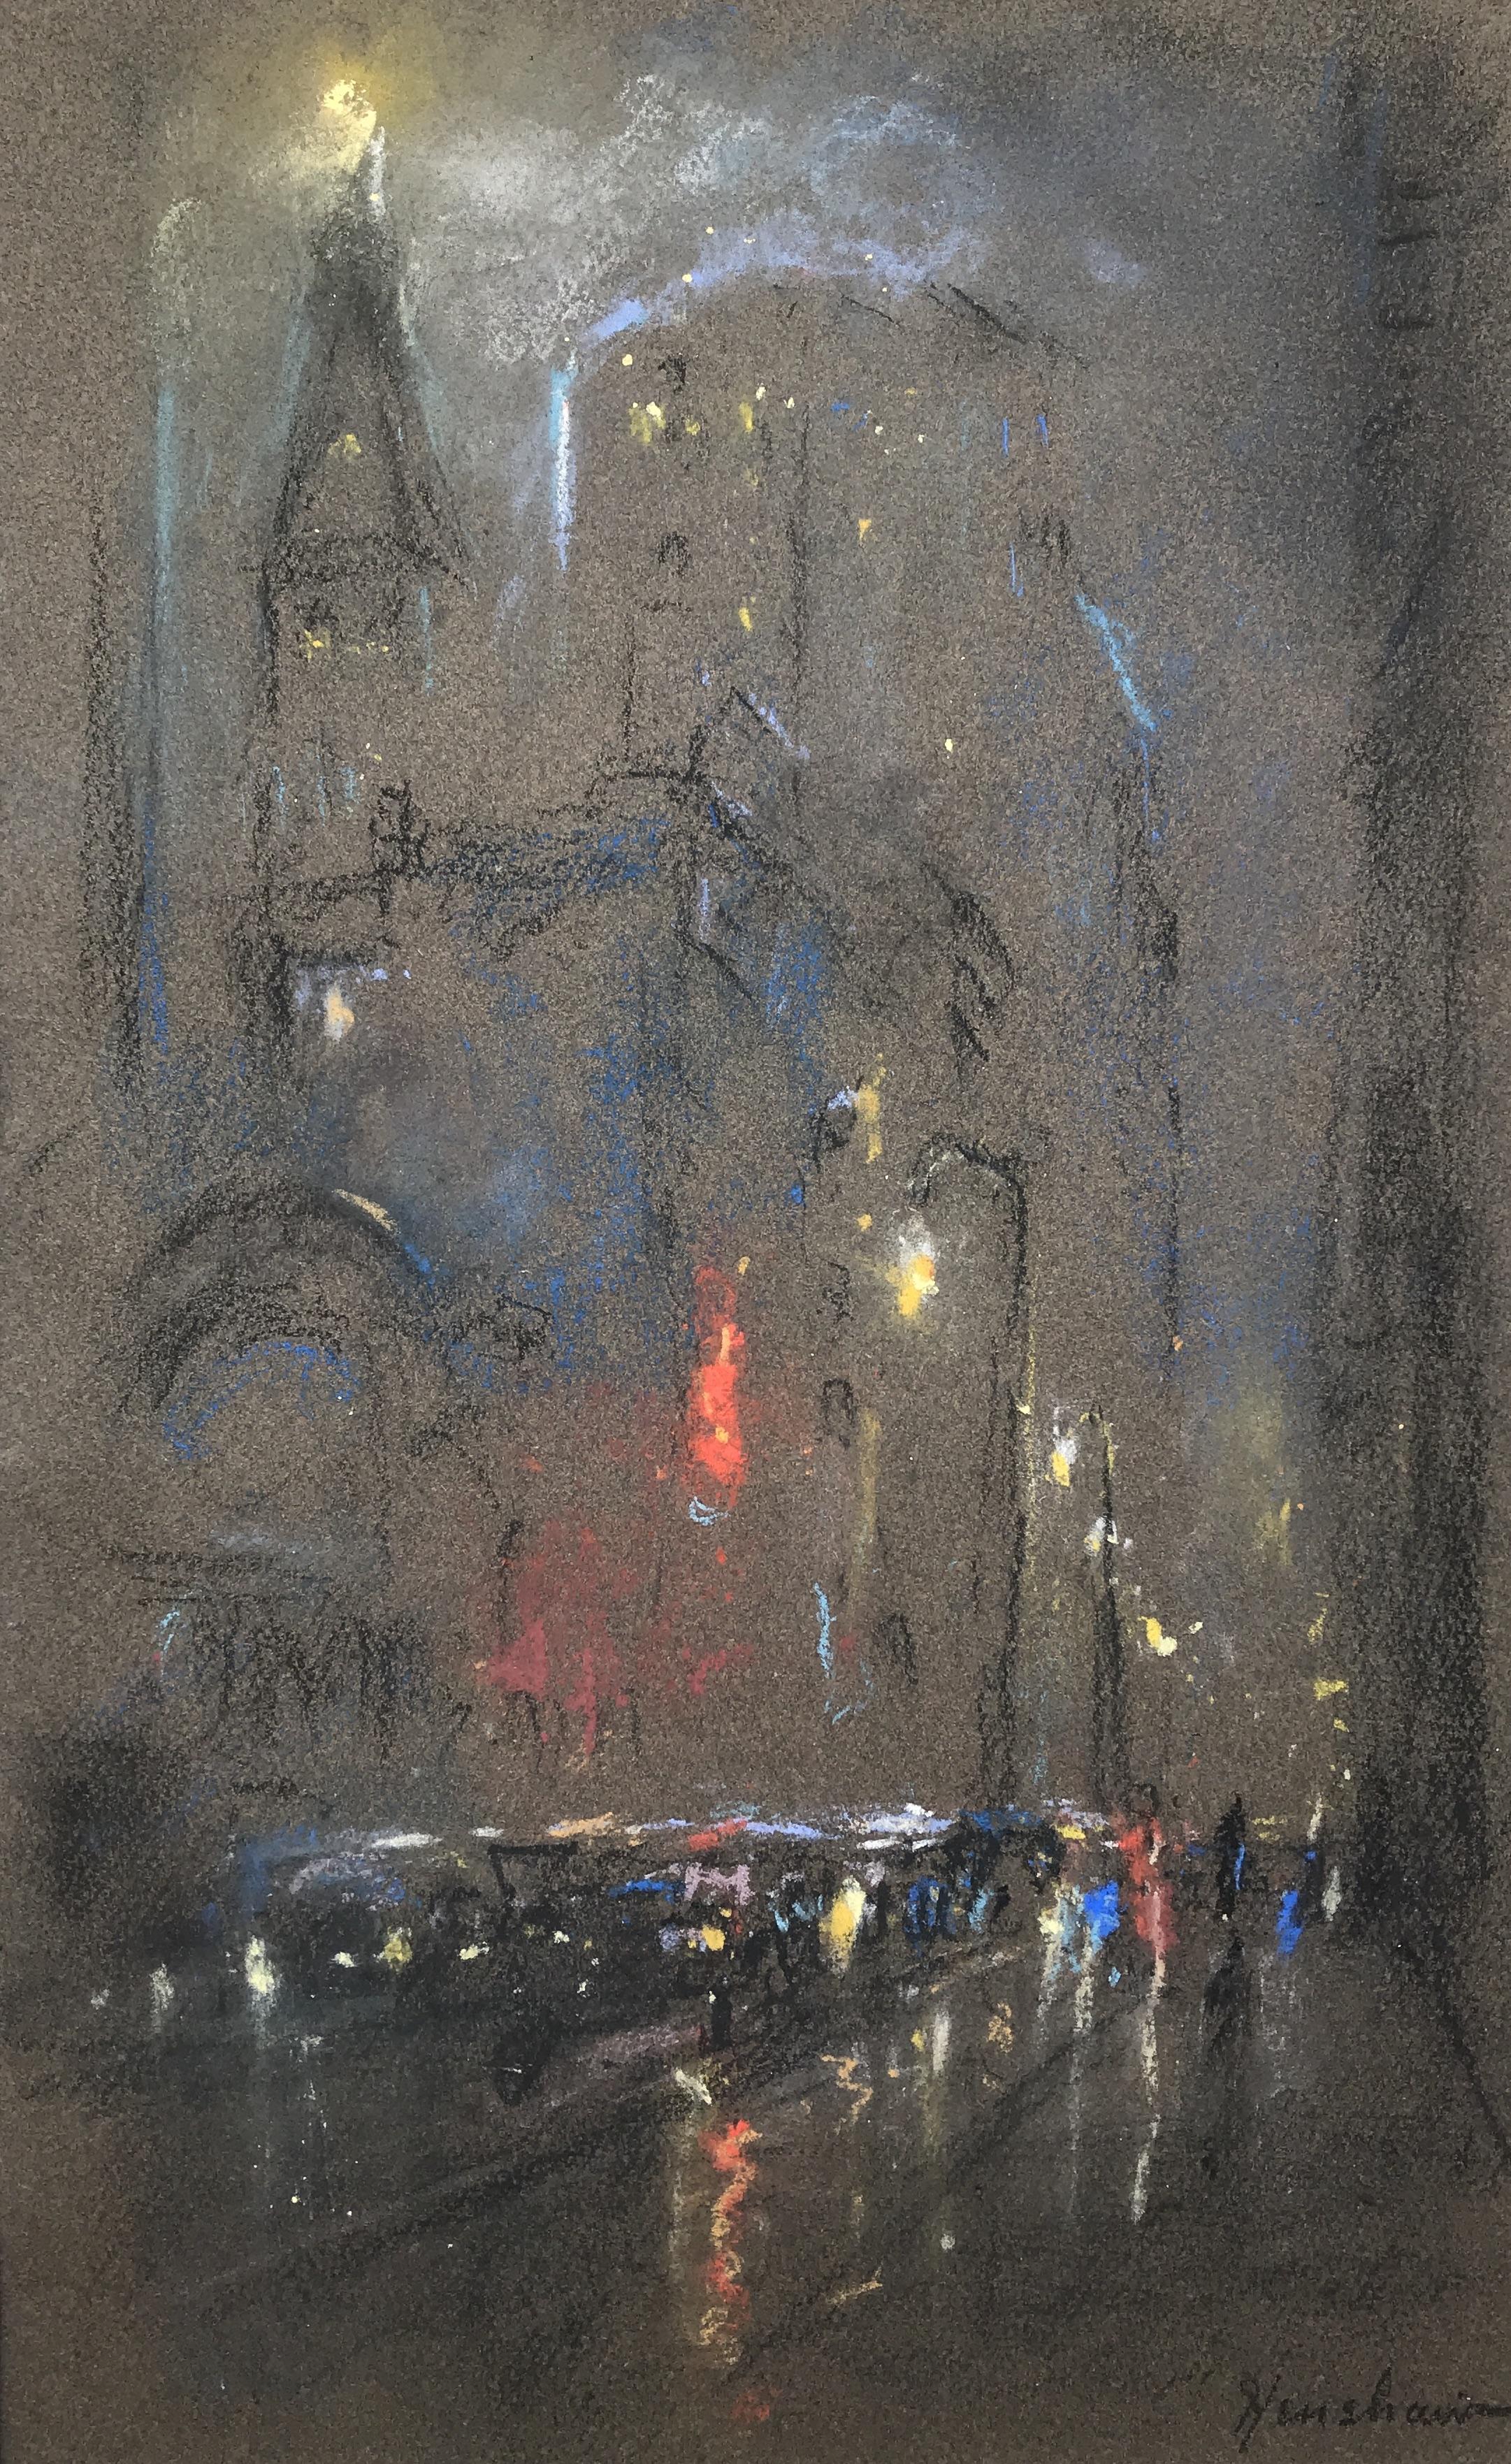 Henshaw-10-23rd Street, New York City-cropped